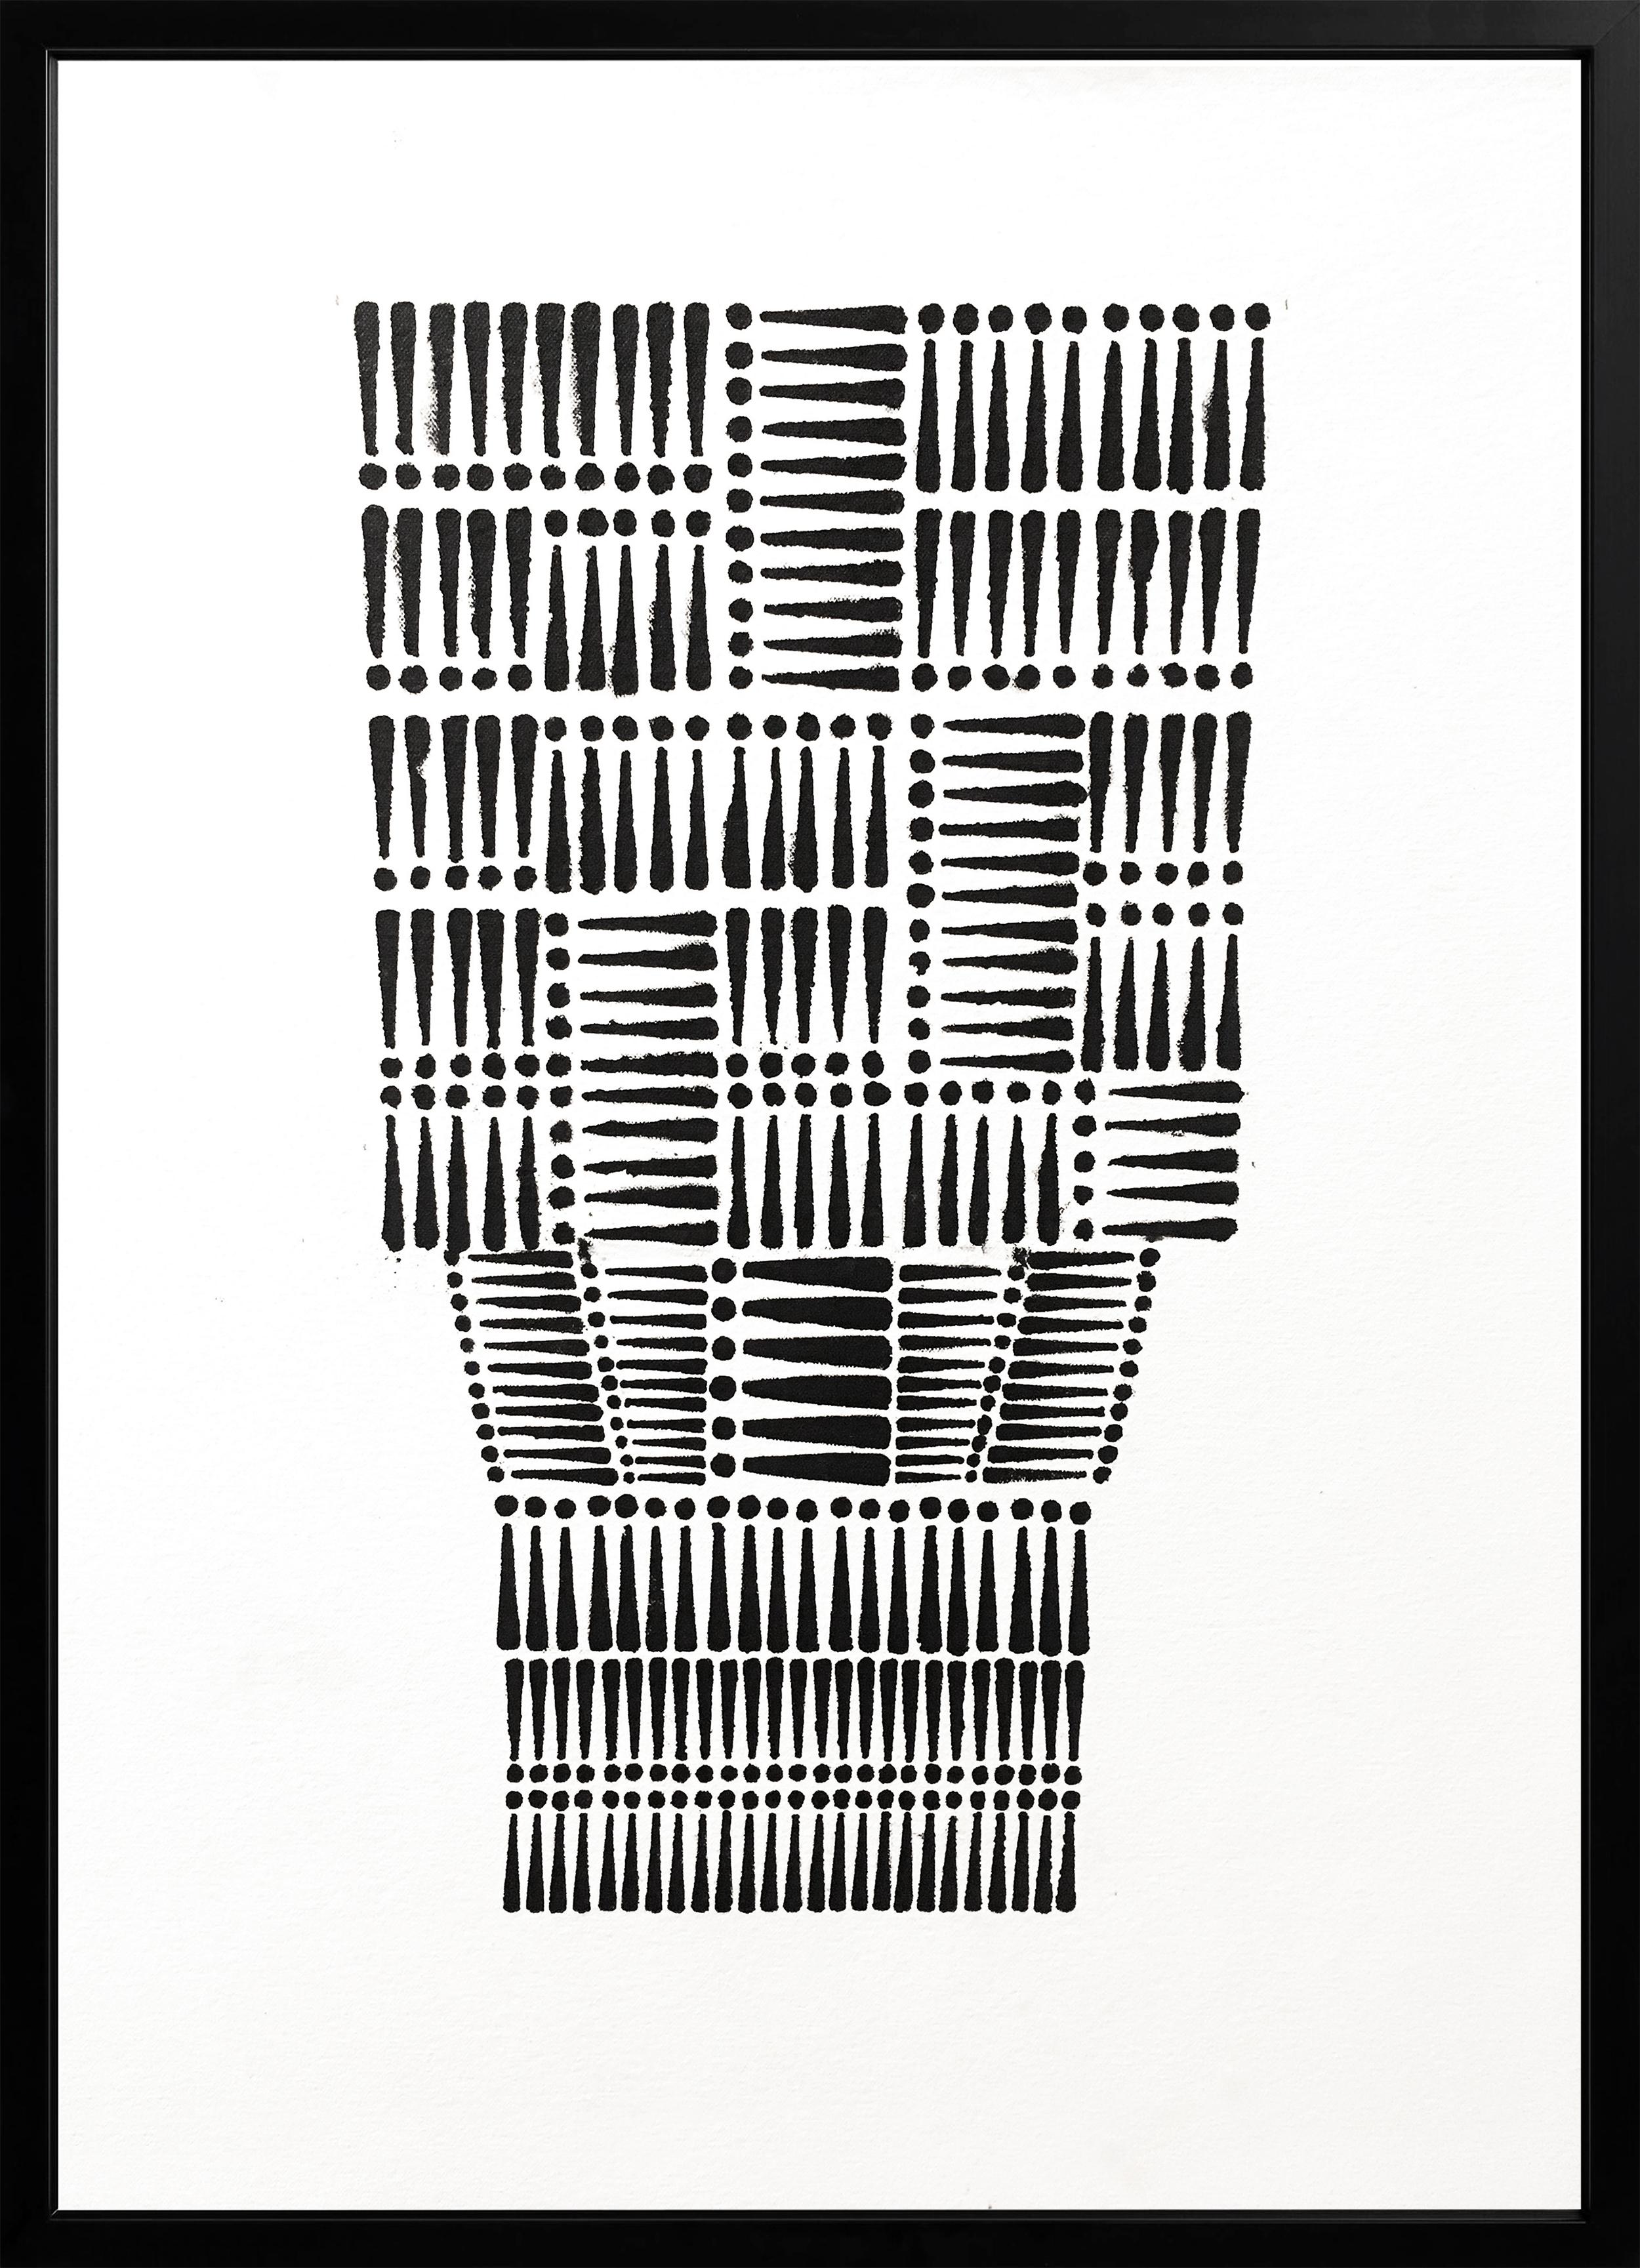 "Title: Cargo Ship II Artist: Jarrett Key Year: 2018 Medium: Oil on gessoed canvas Dimensions: 24"" x 20"" Price: $2000"